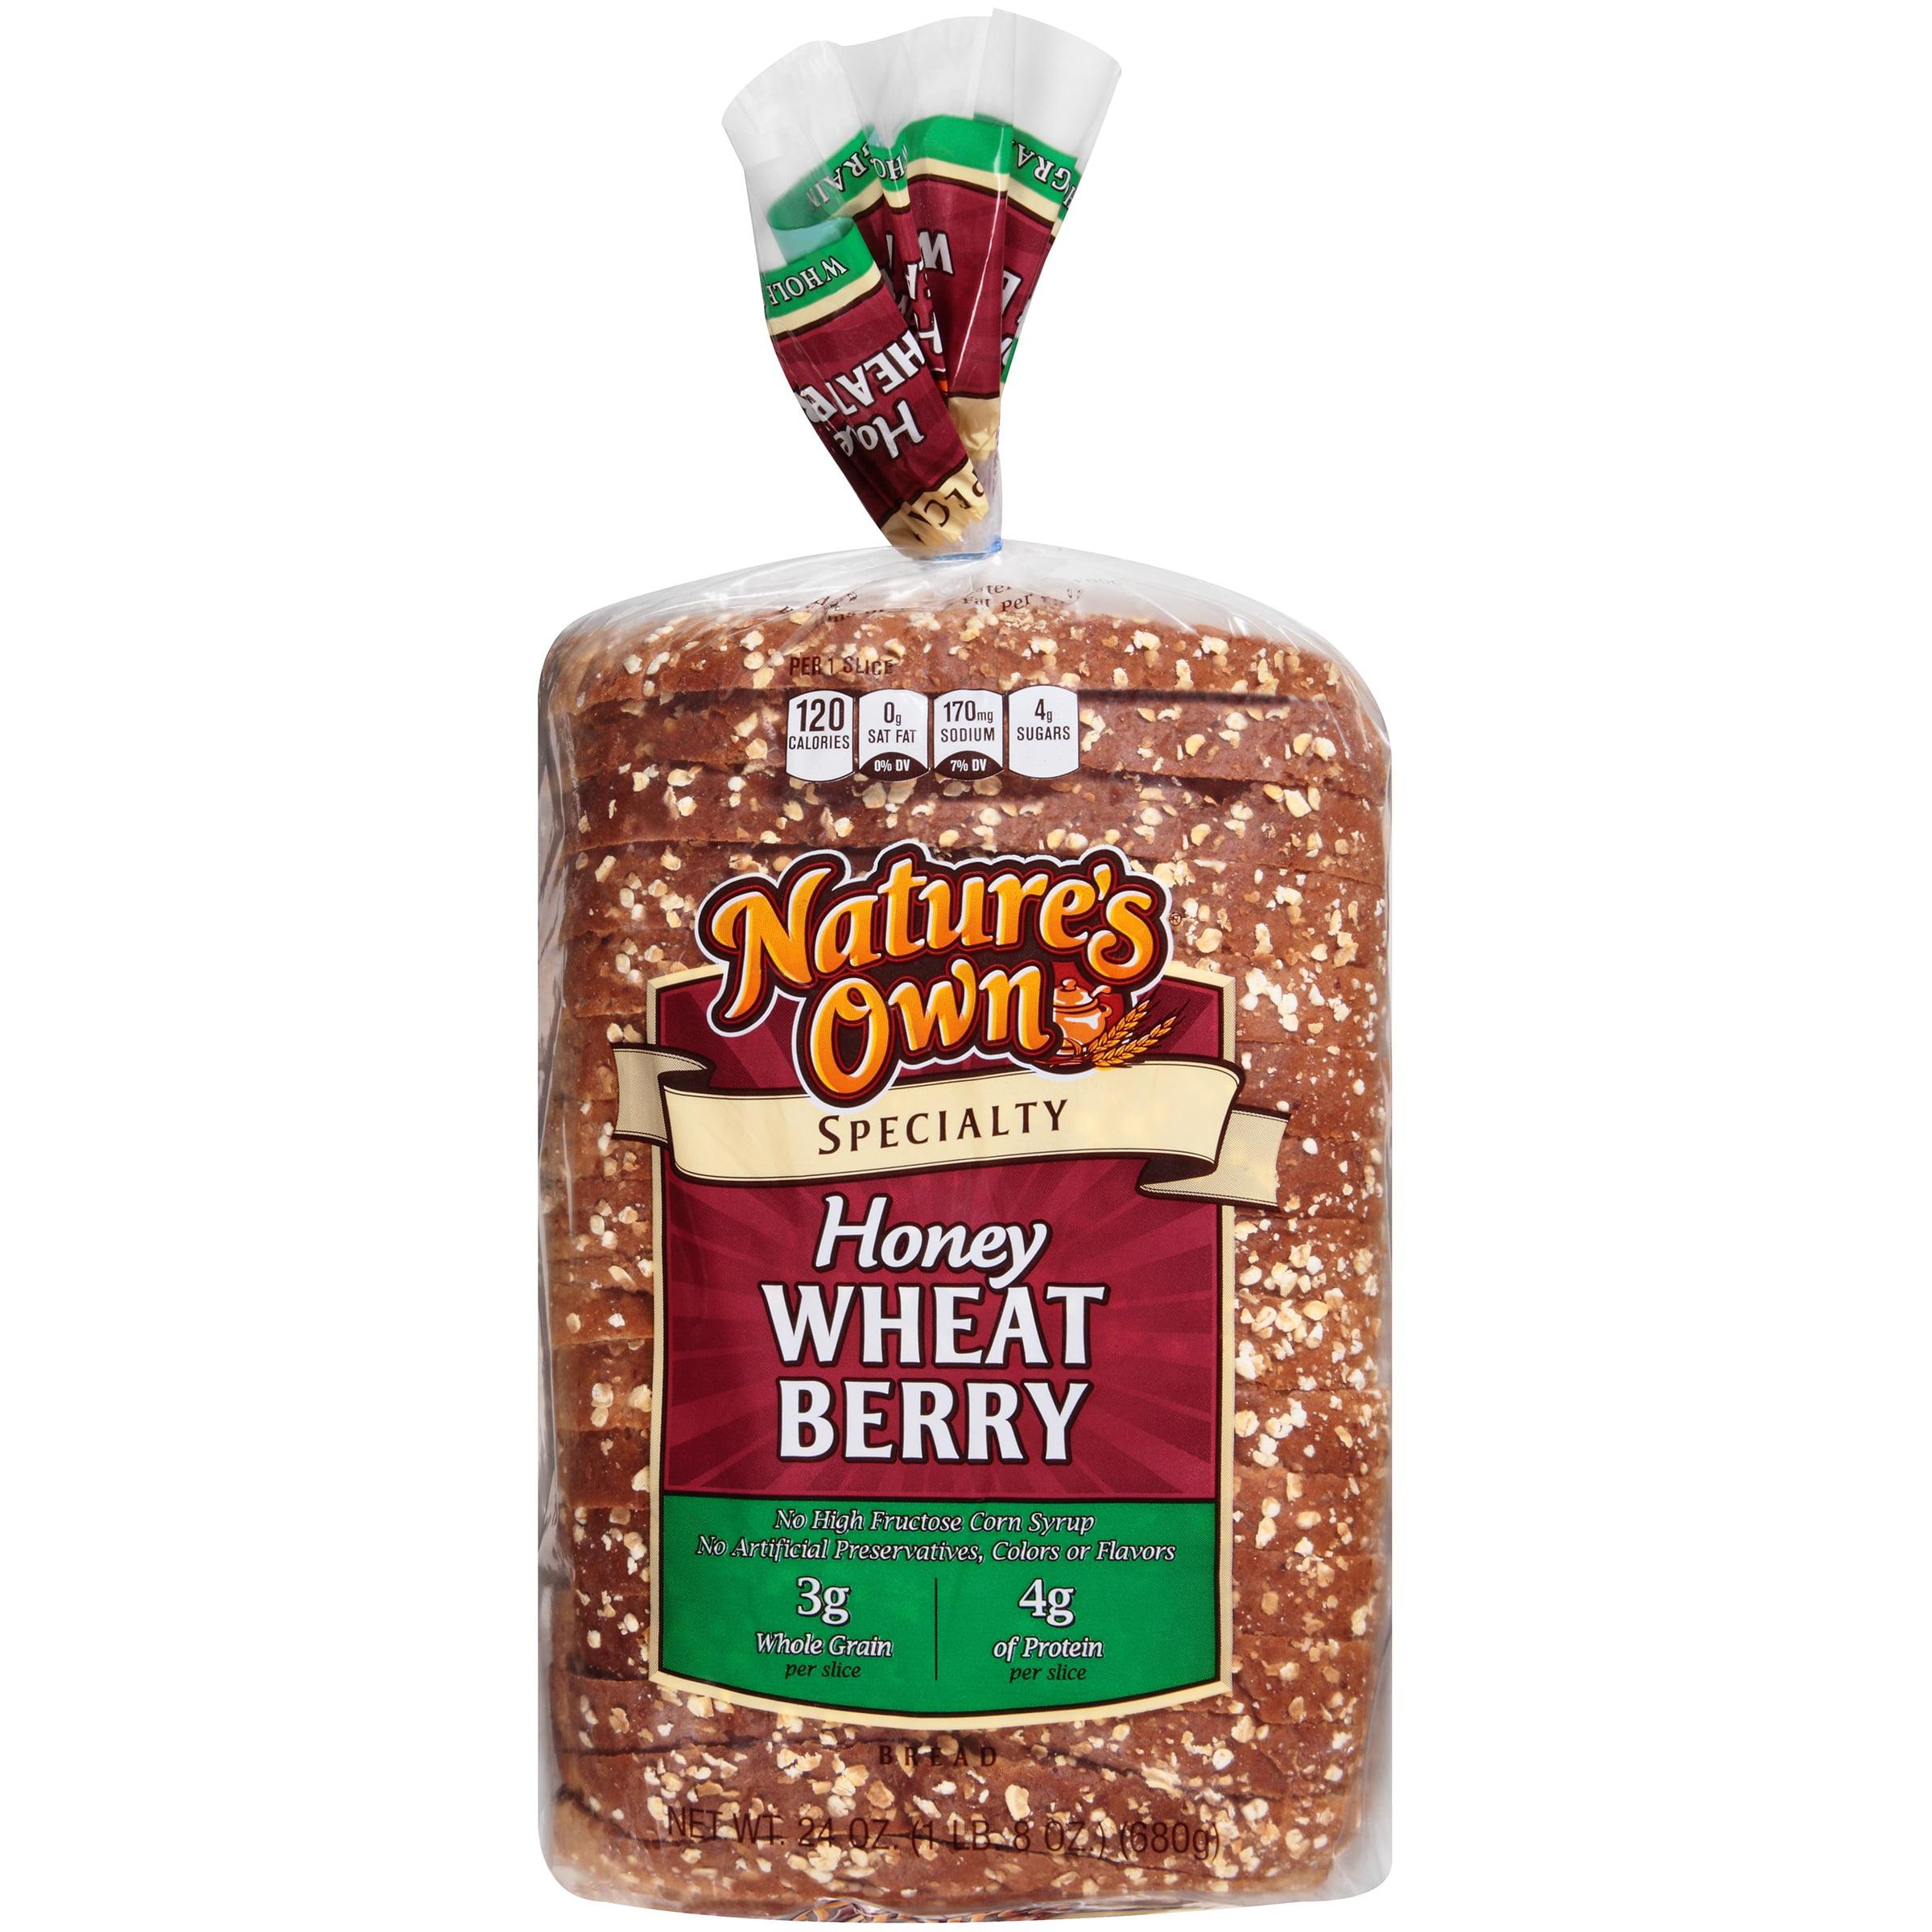 Nature S Own Specialty Honey Wheat Berry Bread 24 Oz Bag Walmart Com